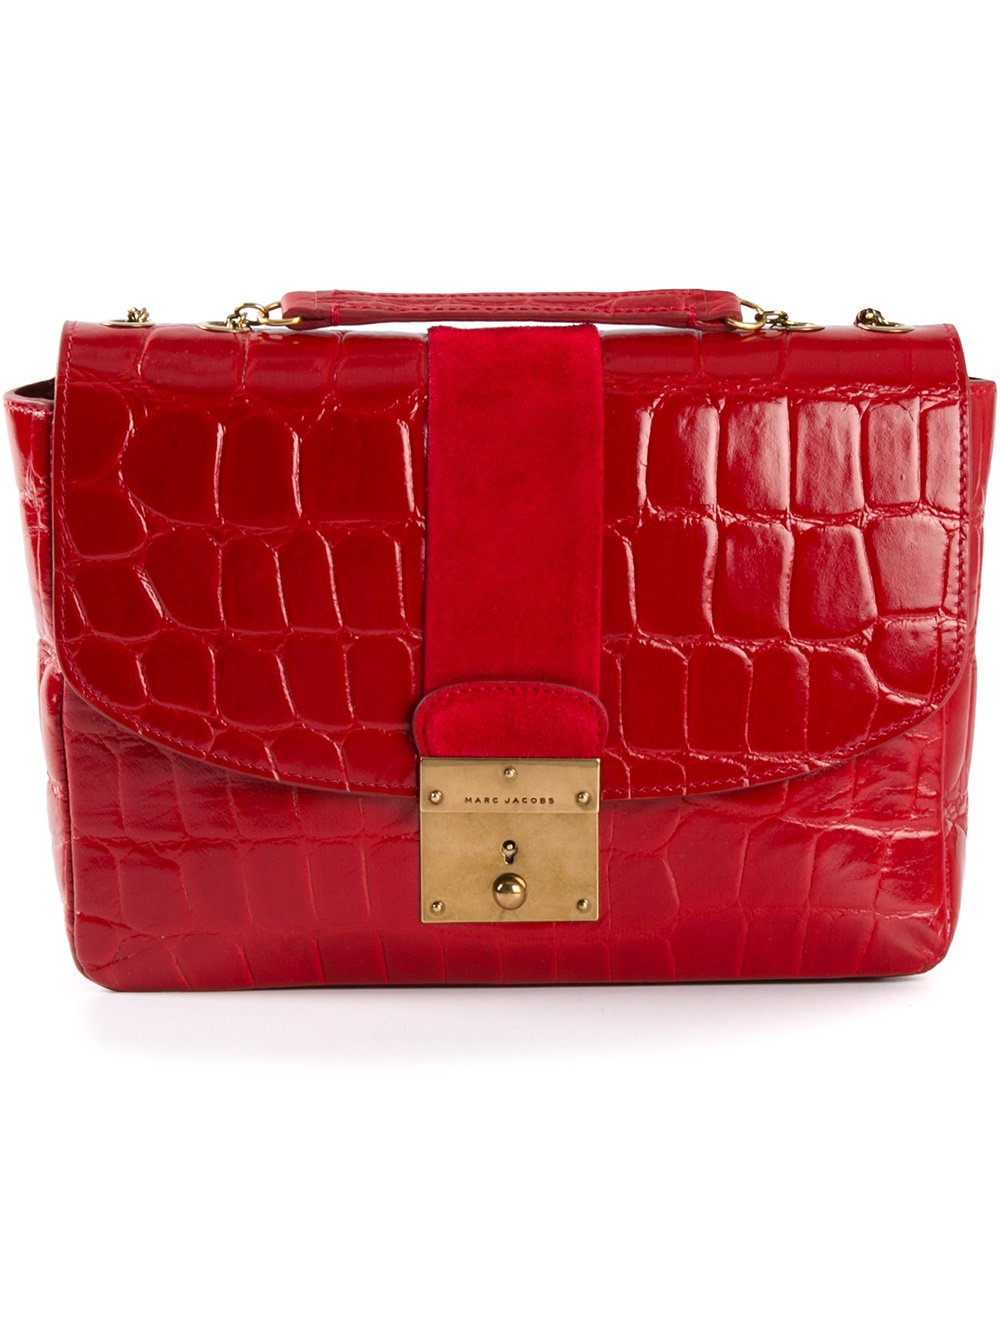 Pre-owned - Crocodile crossbody bag Marc Jacobs R7Gj0